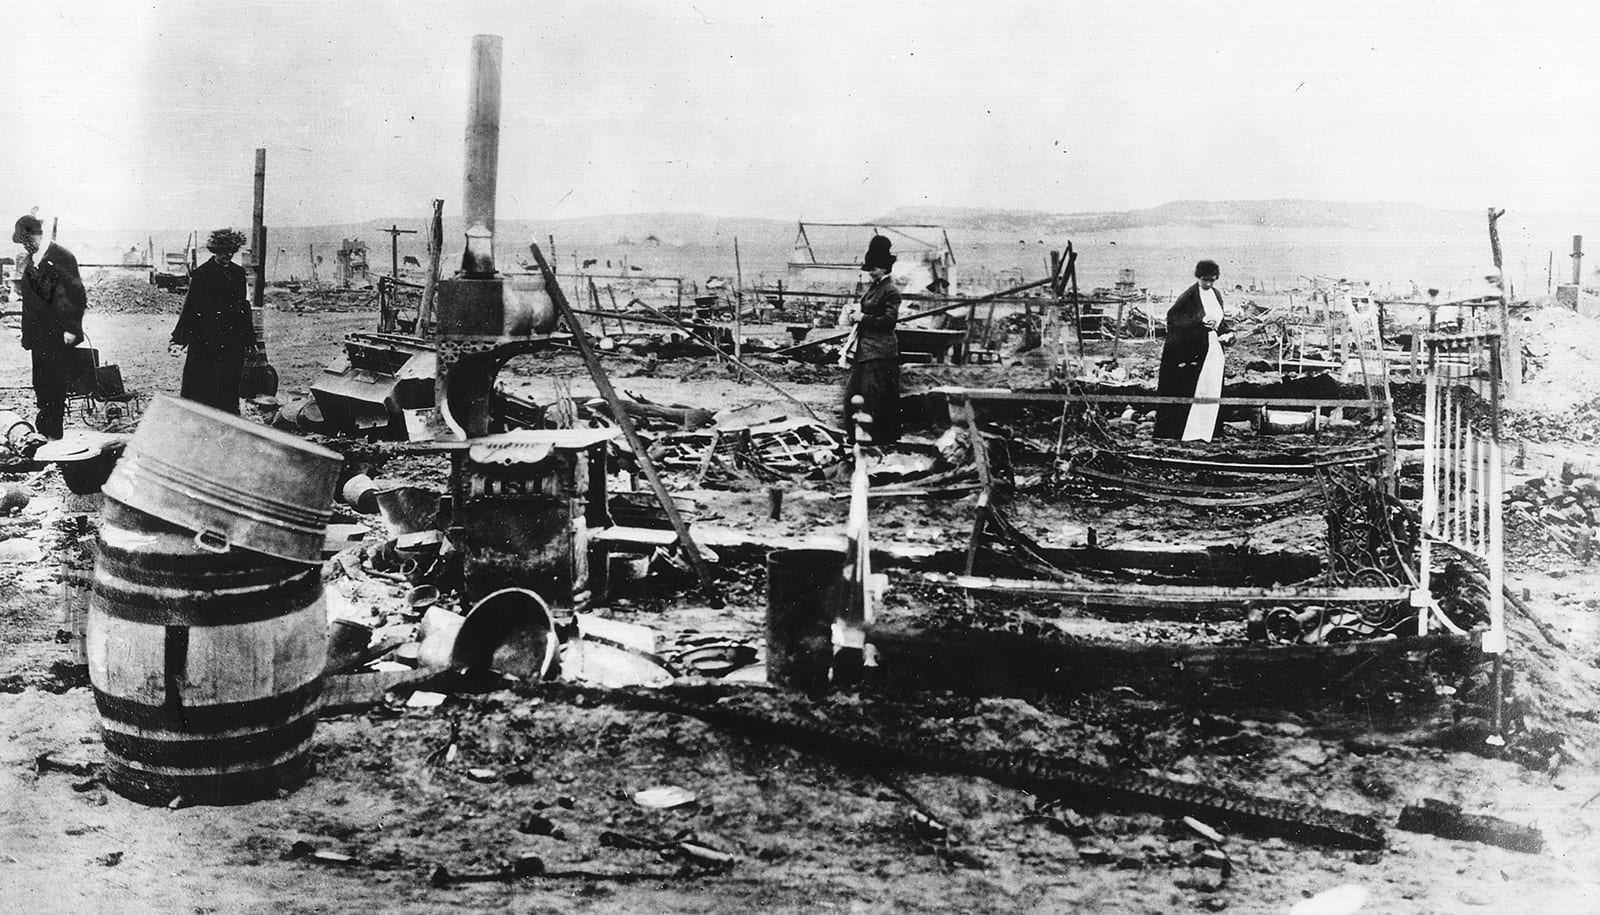 Camp Ludlow Colorado Ruins 1914 After Massacre